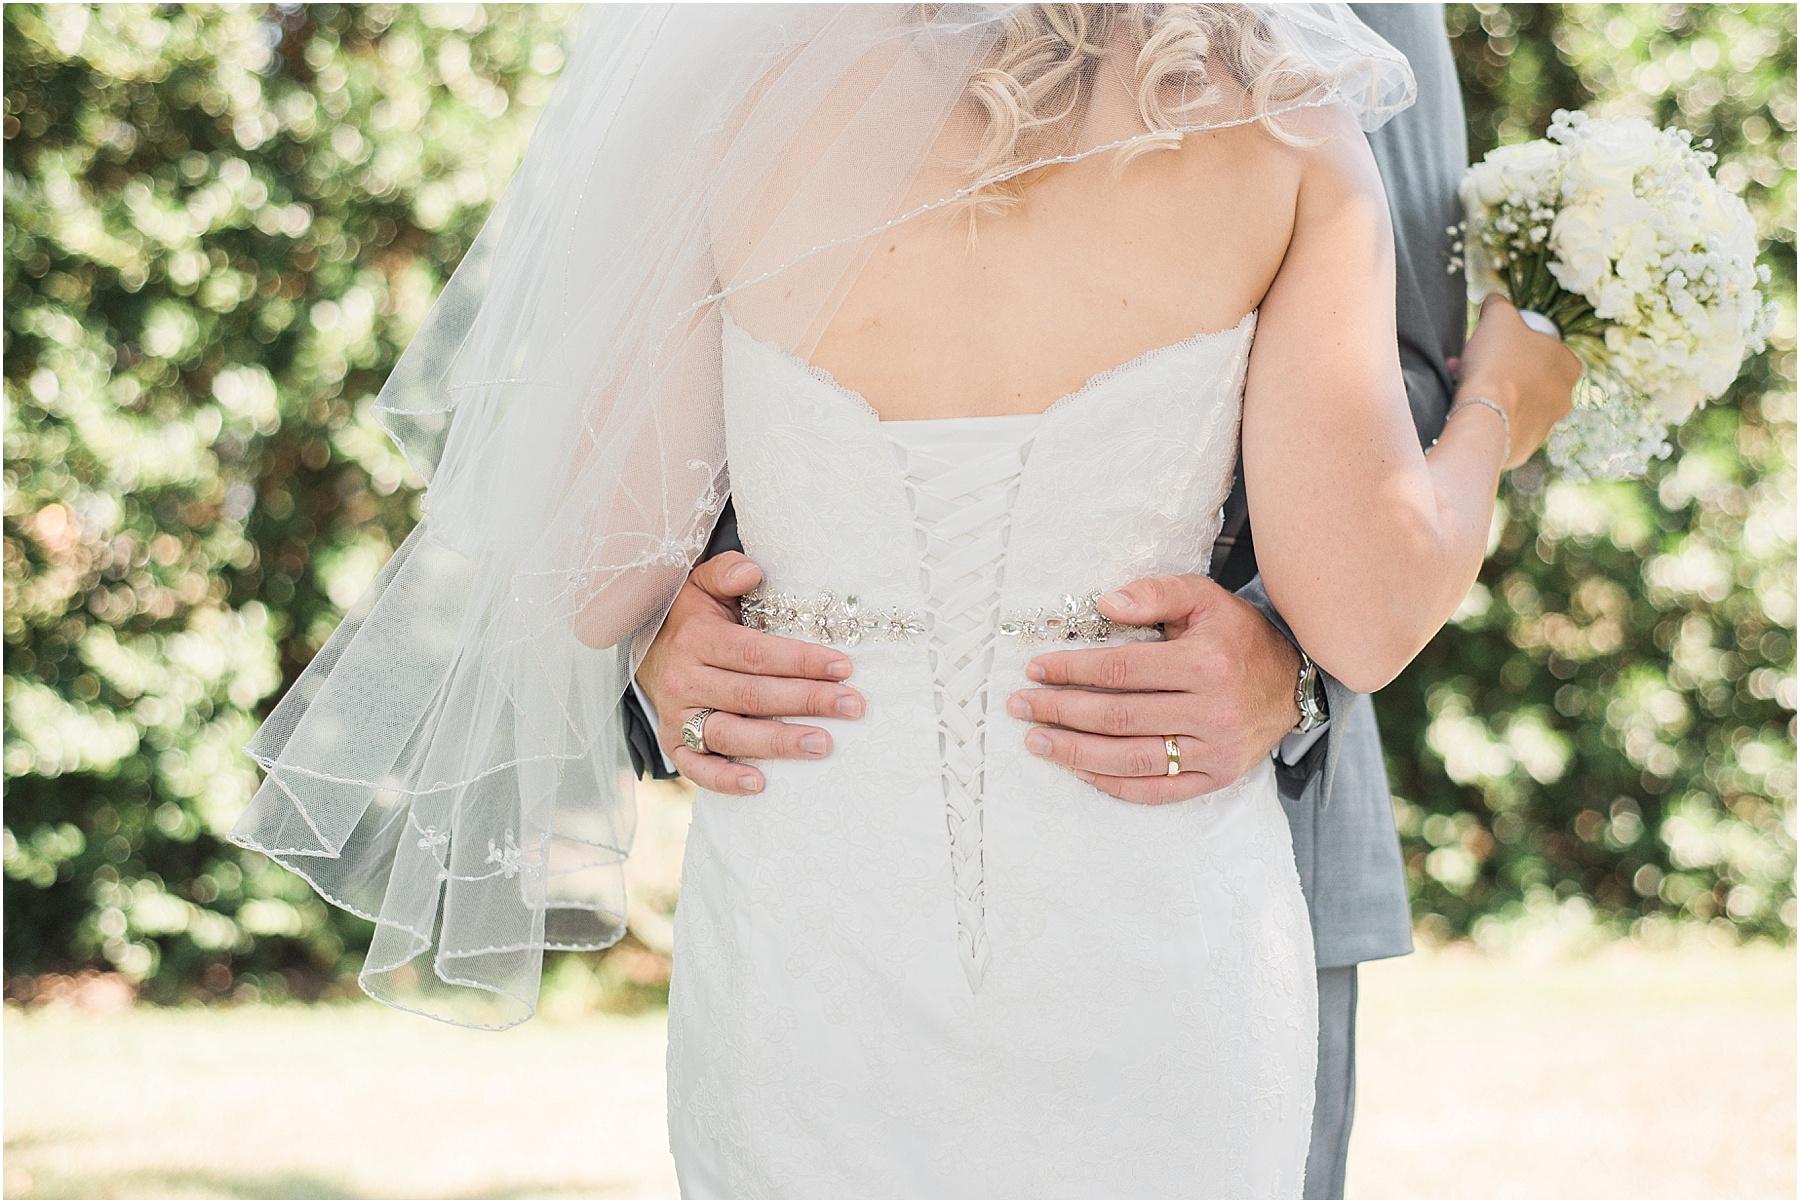 cropped detail shot of groom's hands around bride's waist lake murray chapin columbia sc fine art film wedding photography